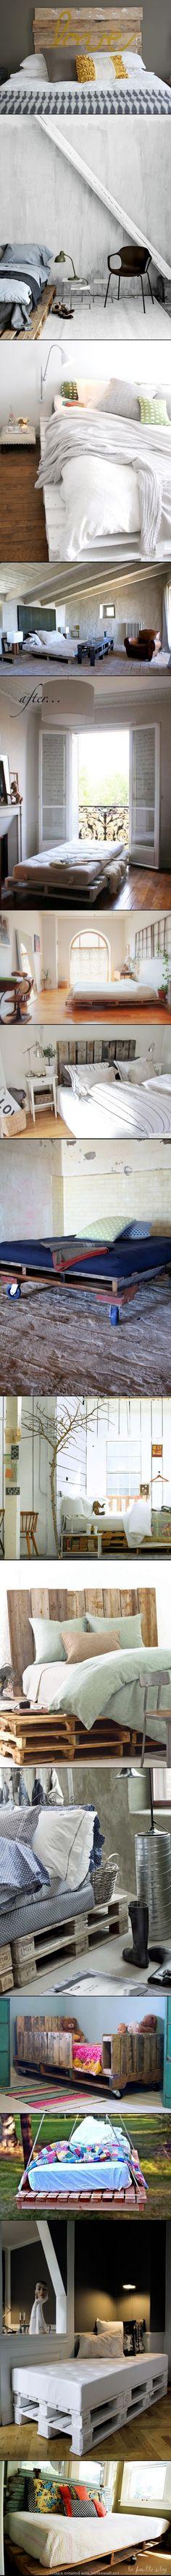 Home Decor Ideas - TOP 15 PALLET BED HACKS